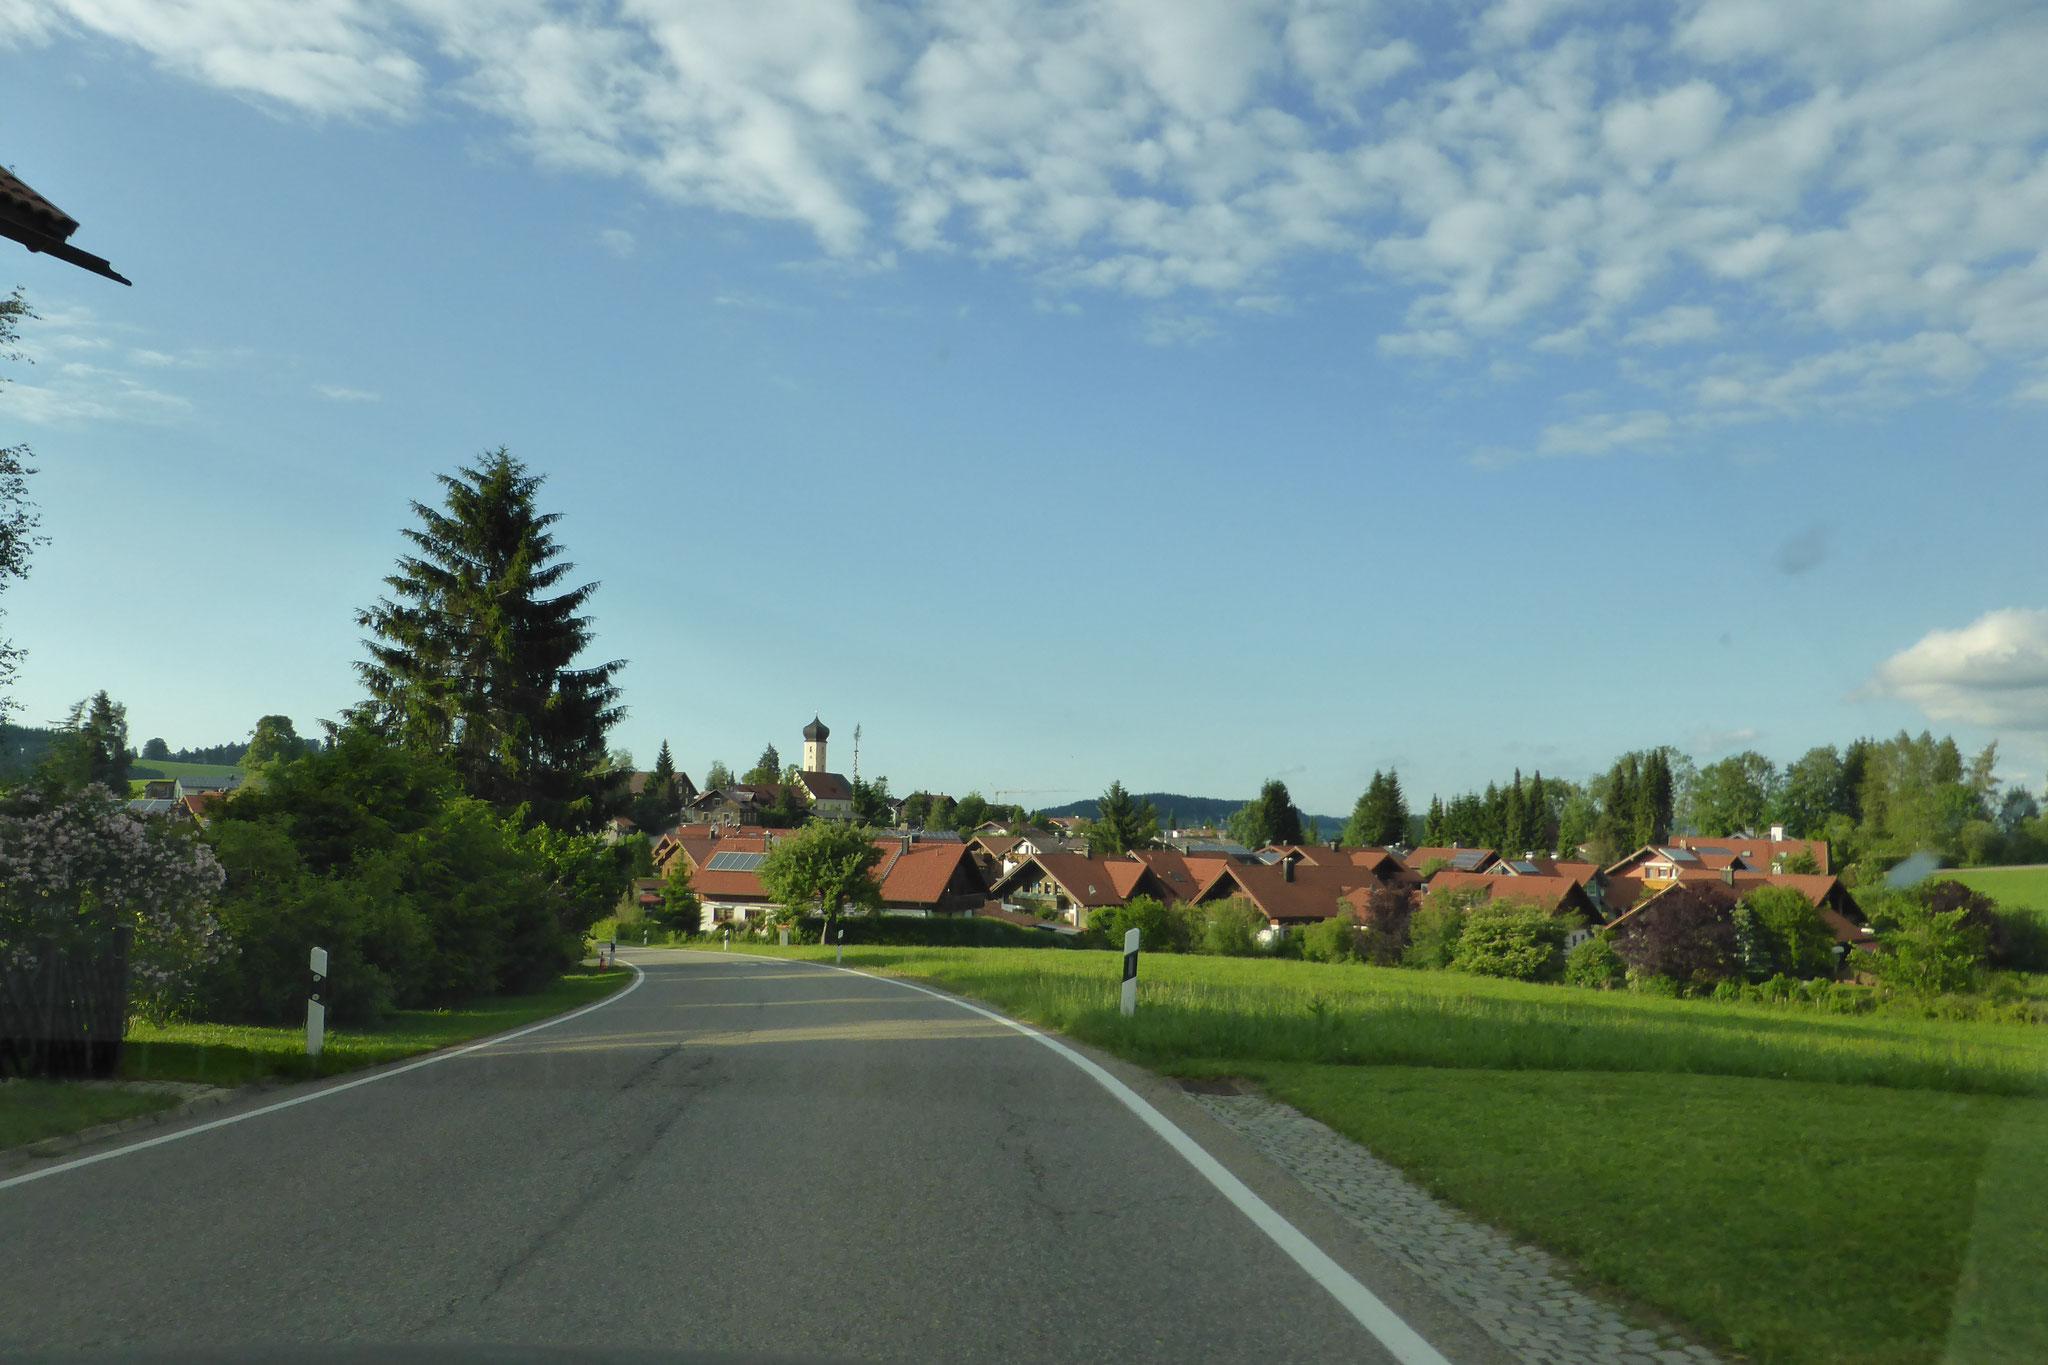 Luftkurort Oberreute